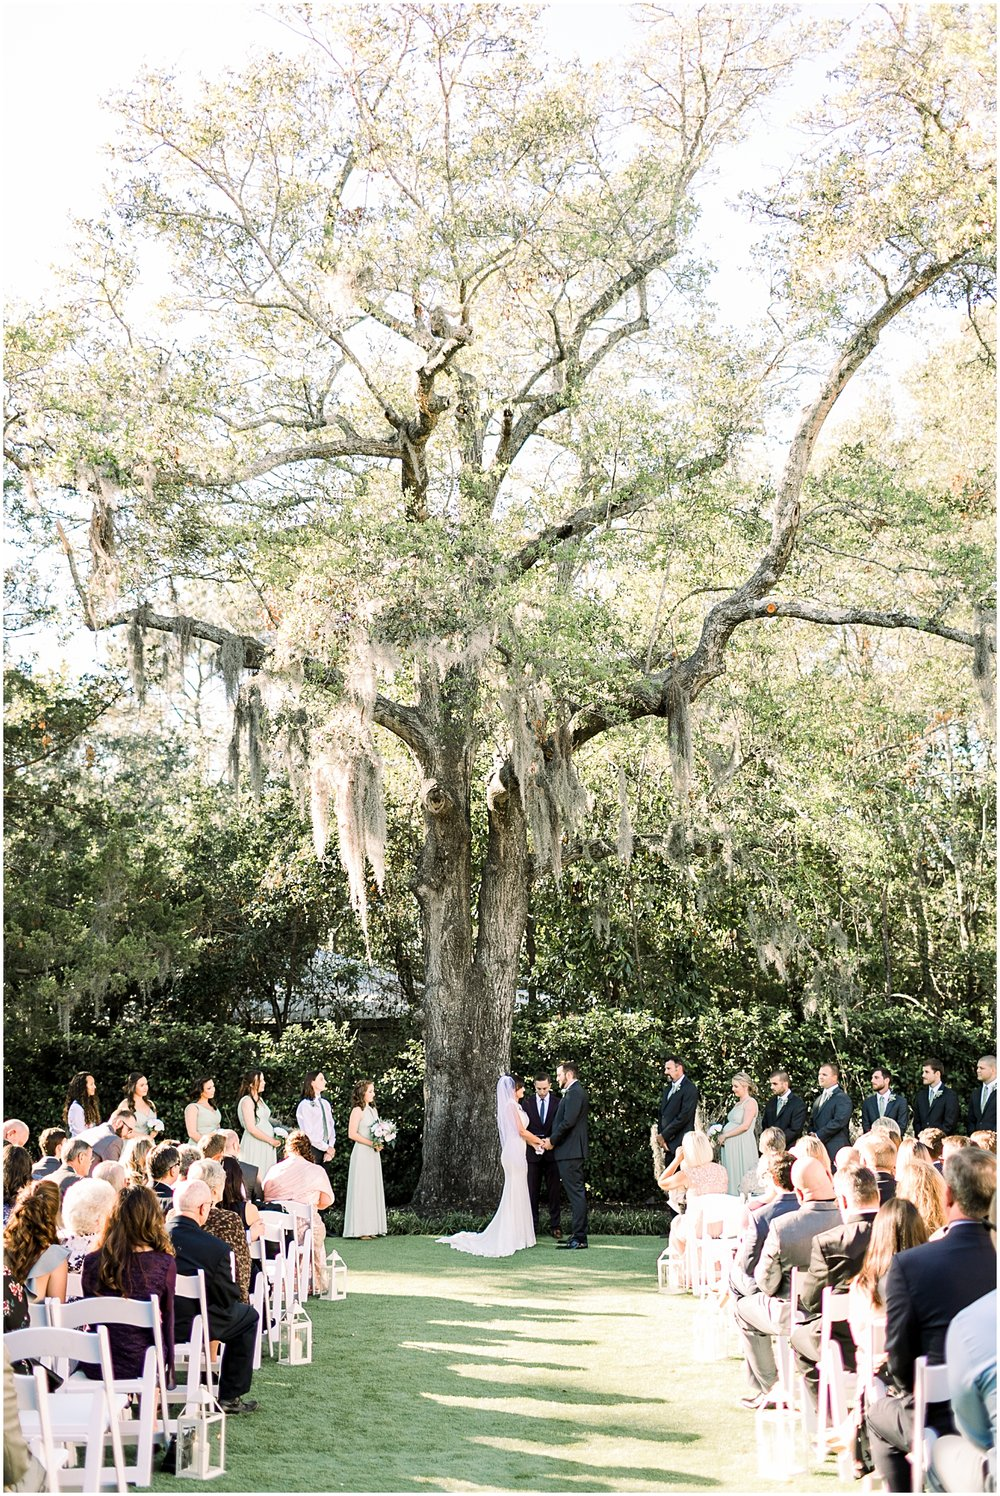 Wrightsville Manor Wedding Venue, Downtown Wilmington NC Wedding_Erin L. Taylor Photography_0008.jpg